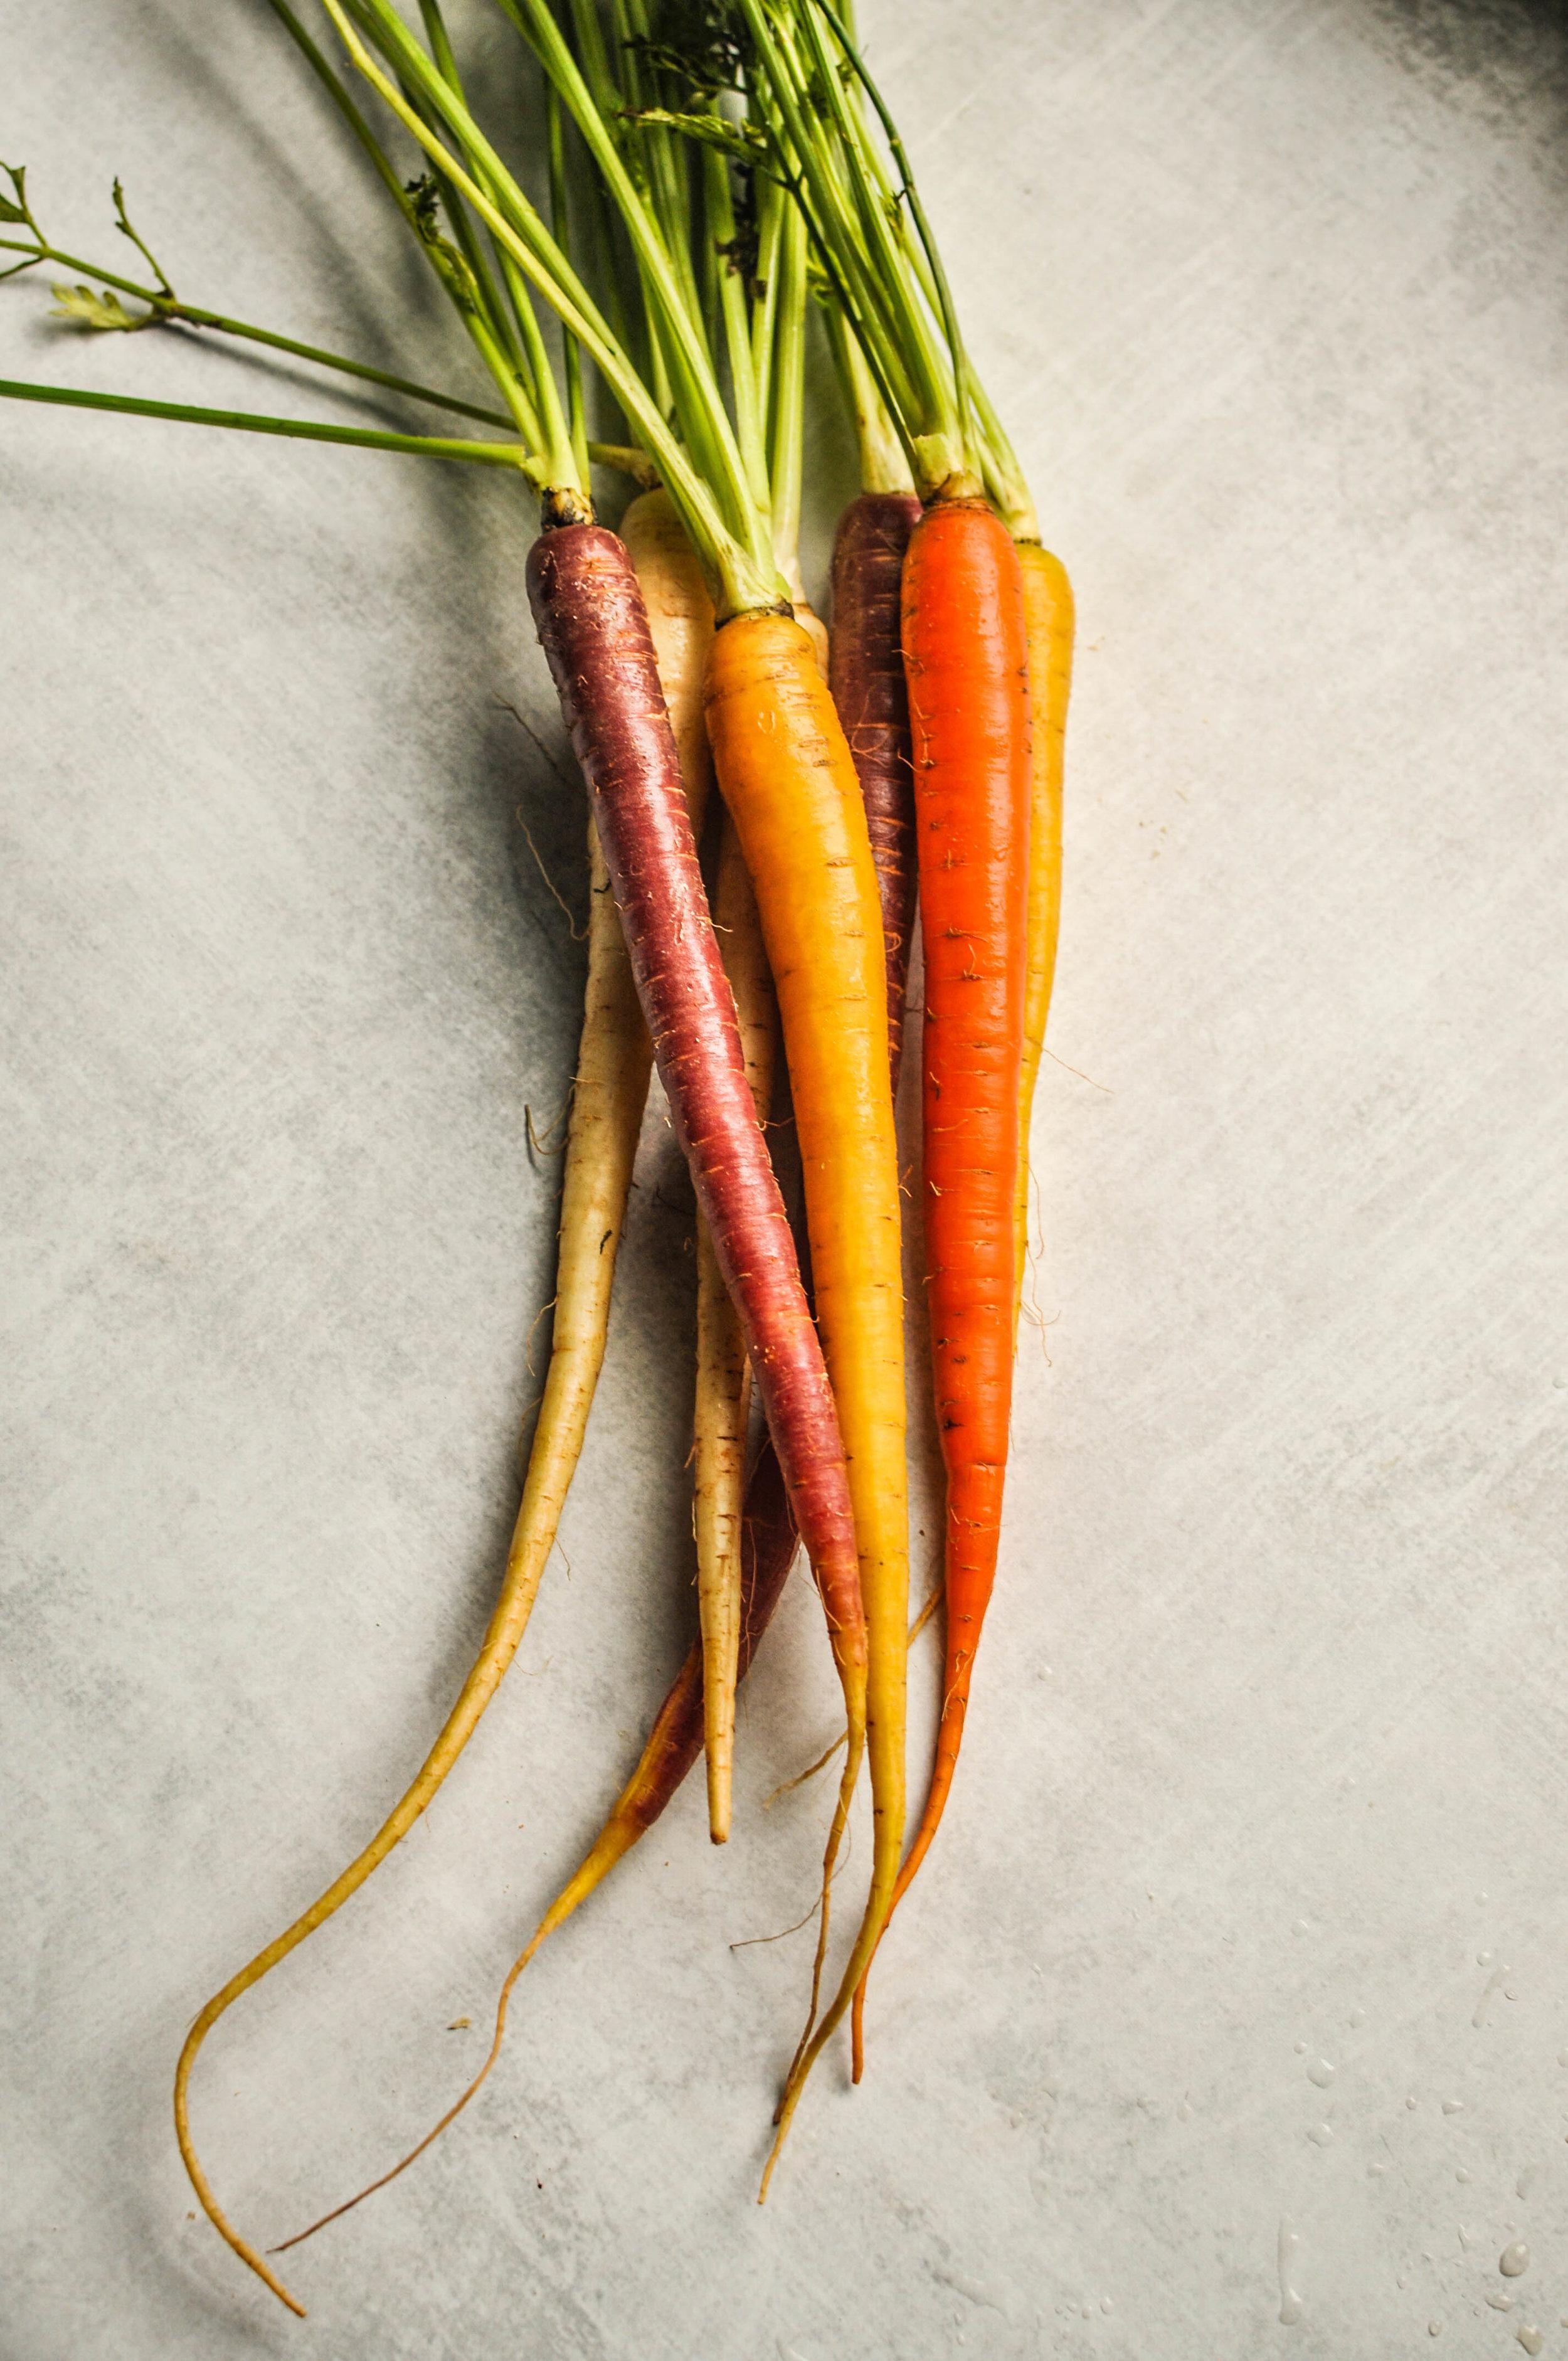 Ribollita soup ingredients - carrots